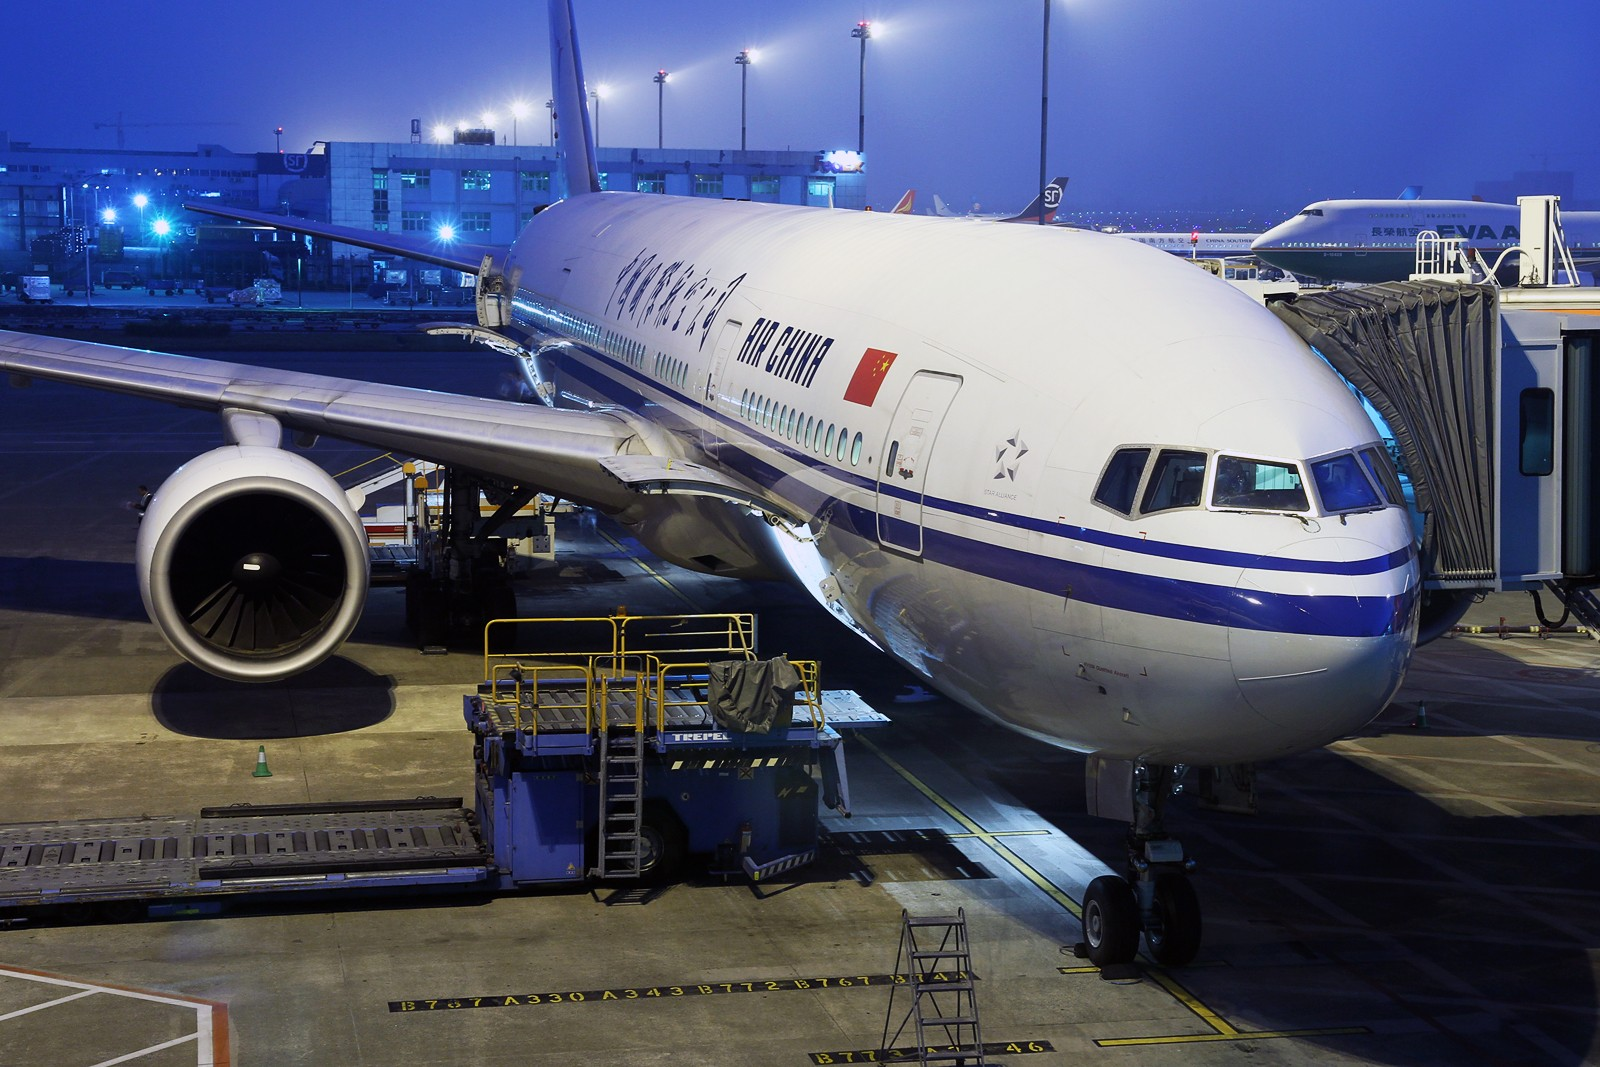 Re:[原创]【HKG】**********HKG第二次流窜归来,比较有代表性的3pics********** BOEING 777-2J6 B-2067 中国深圳宝安机场